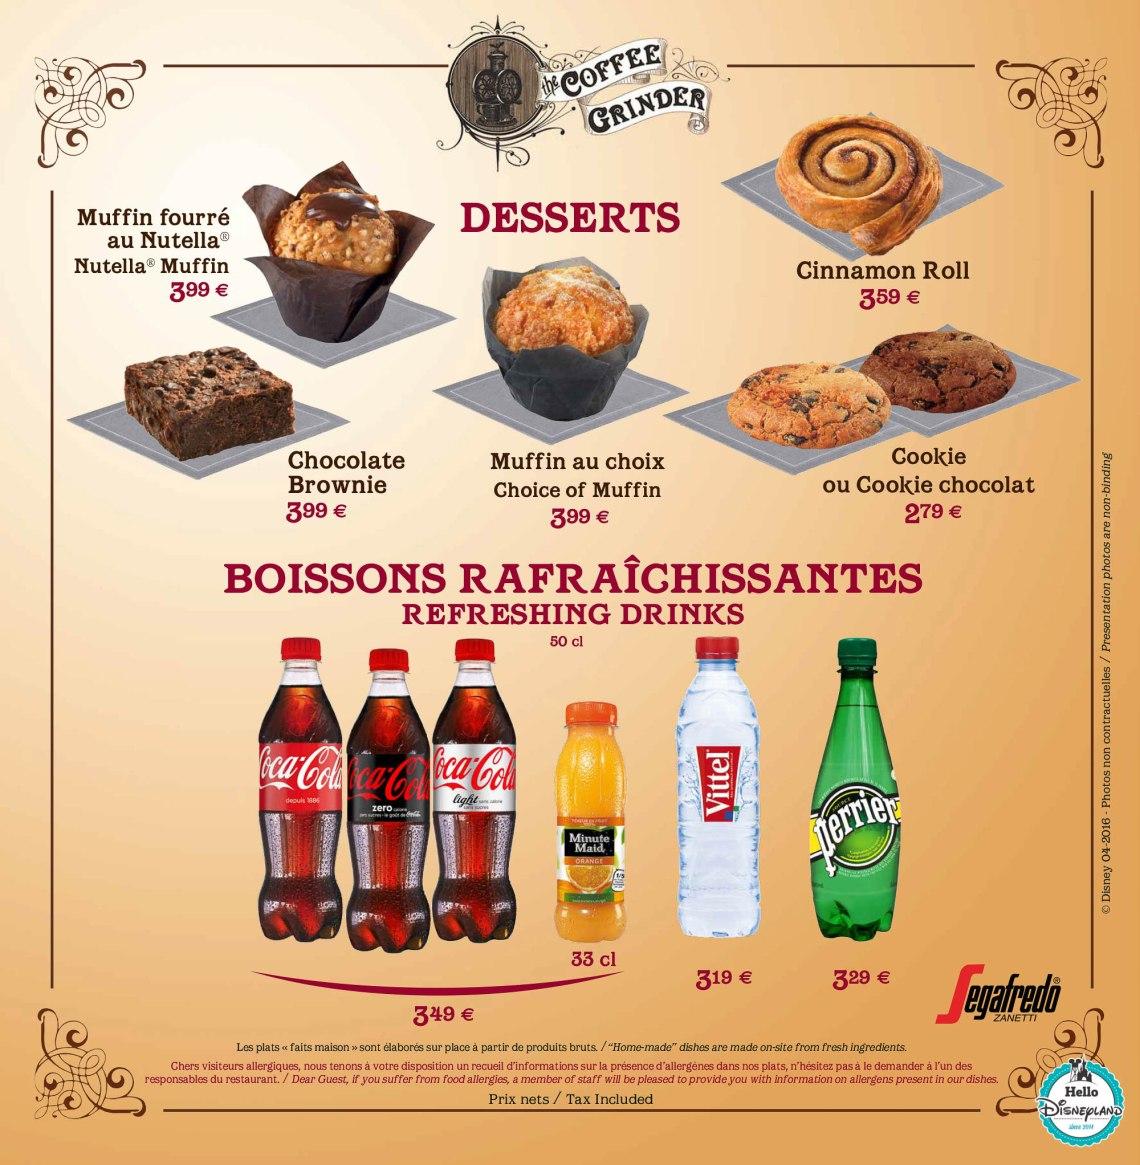 Disneyland-Paris-restaurant-menu-2016-Coffee-grinder-avril-2016-1